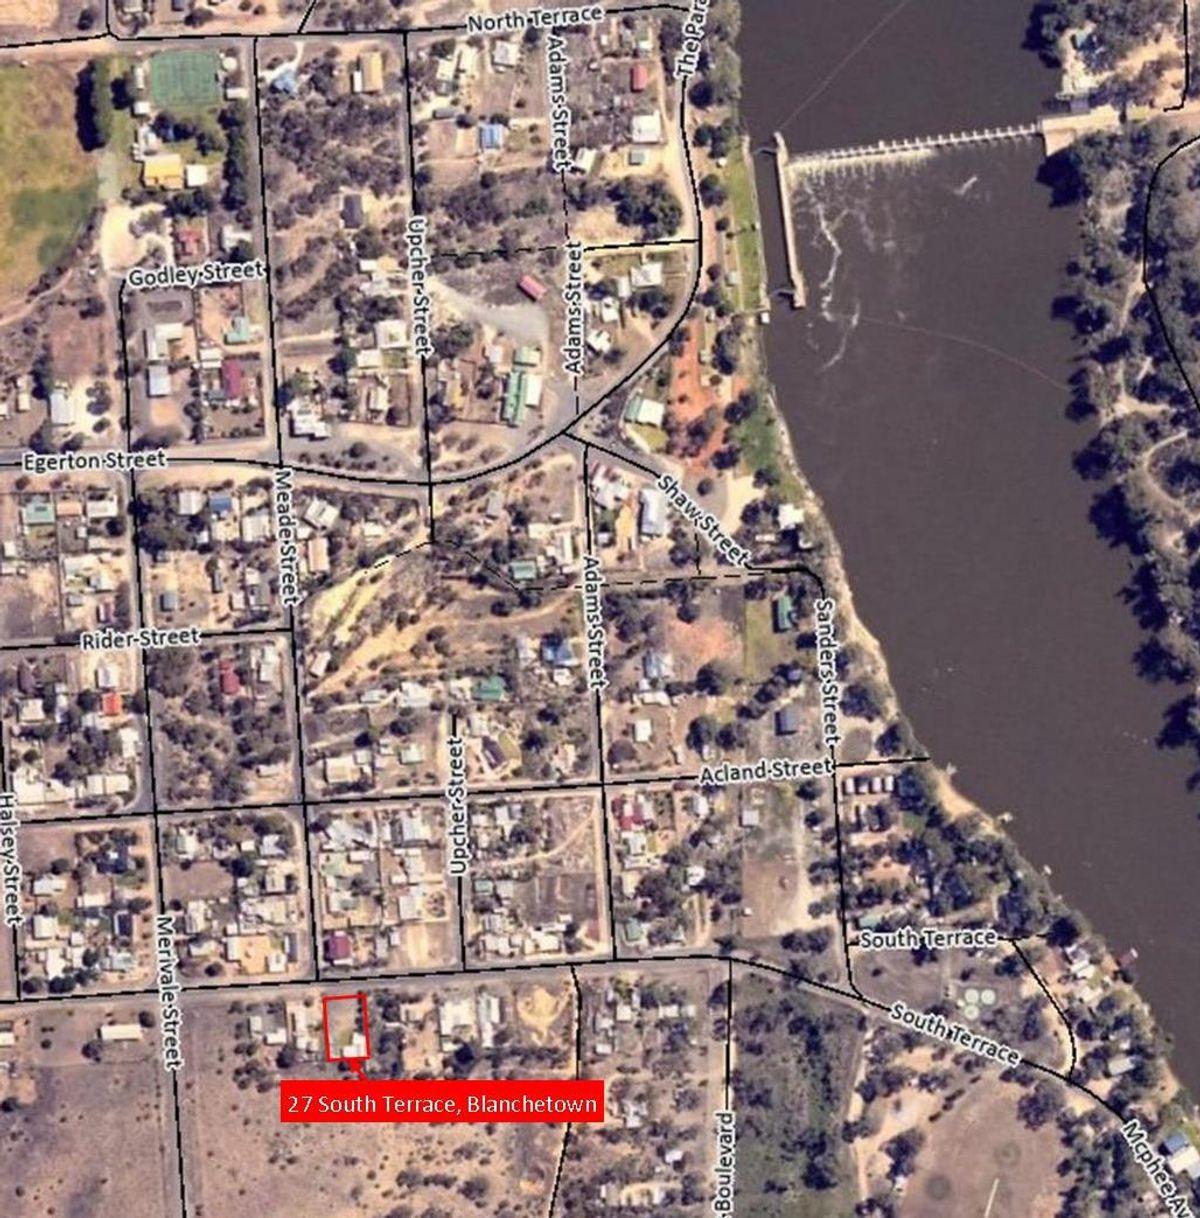 27 South Tce, Blanchetown, SA 5357